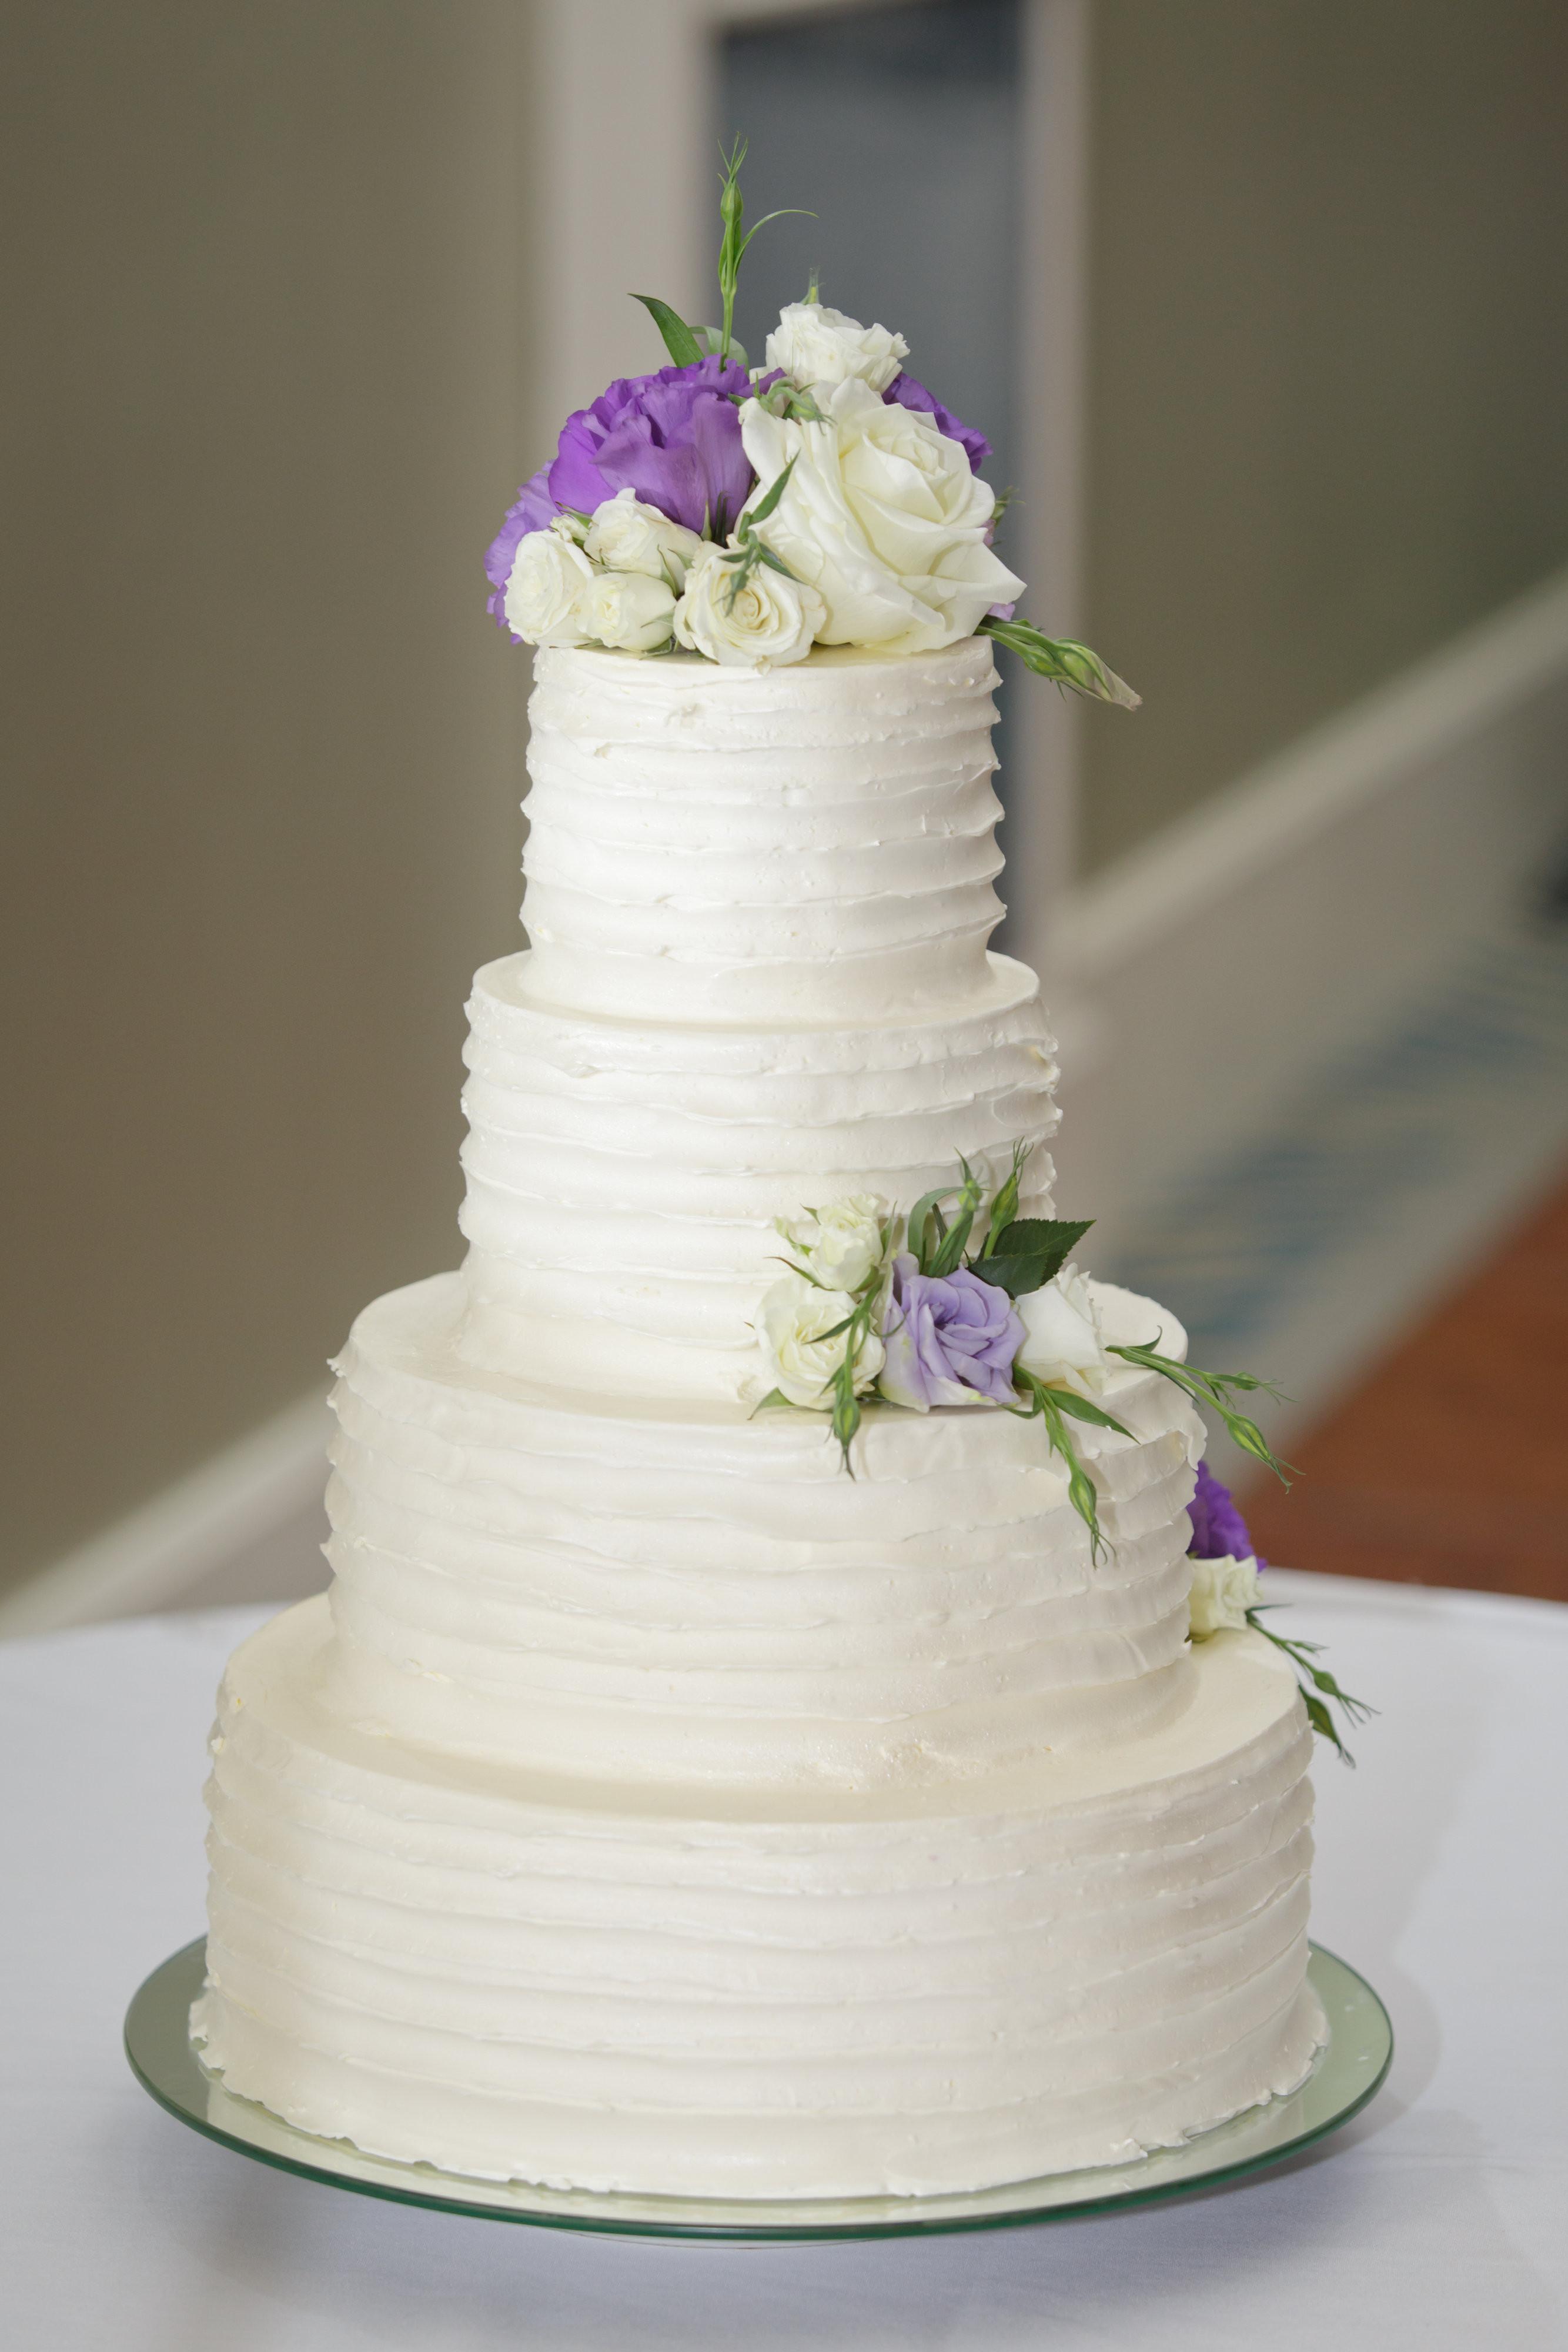 Wedding Cakes Florida  Wedding cakes destin fl idea in 2017